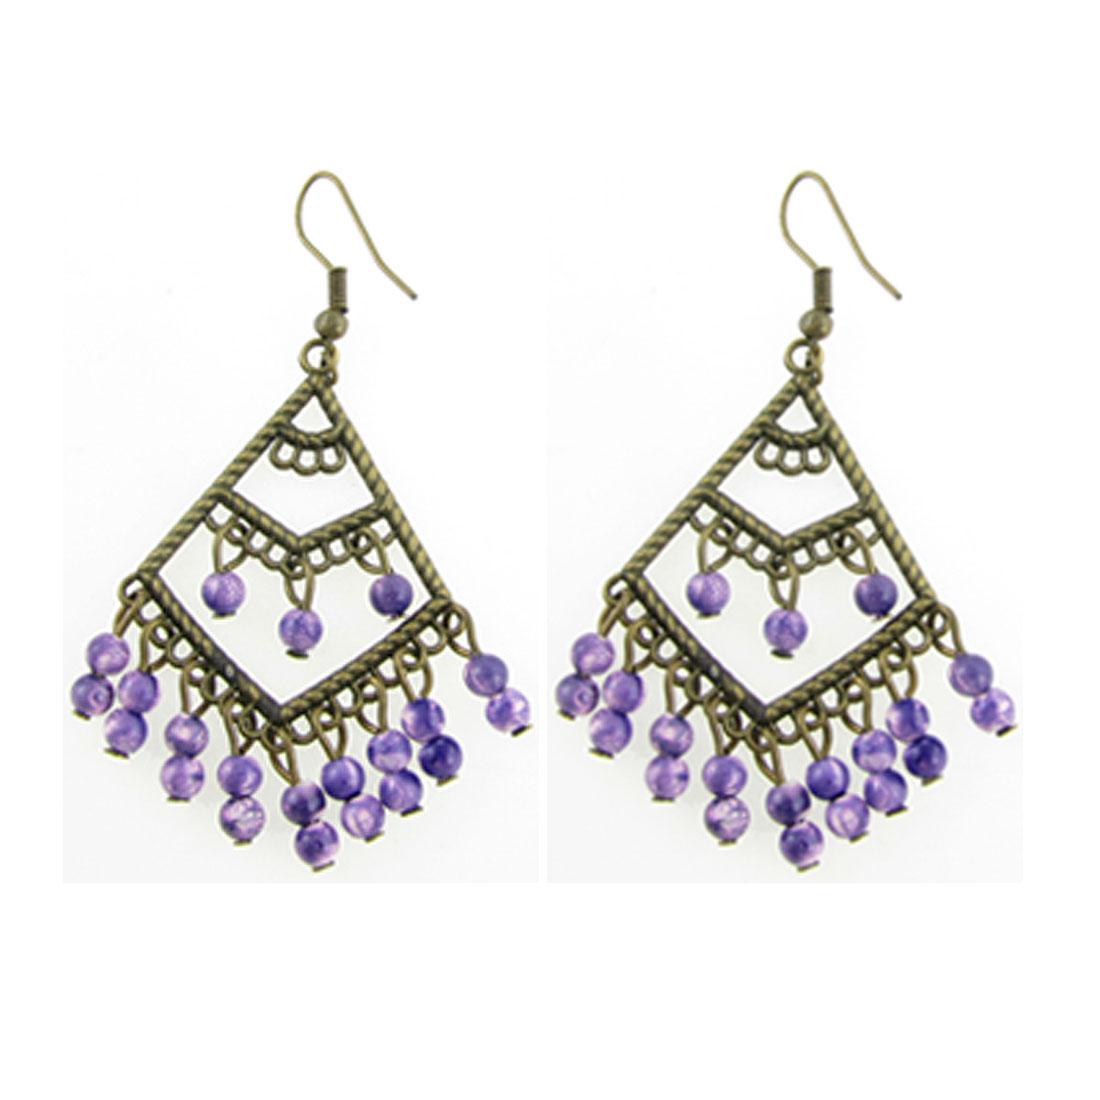 Bronze Tone Purple Beads Decor Rhomb Shape Hook Earrings for Lady